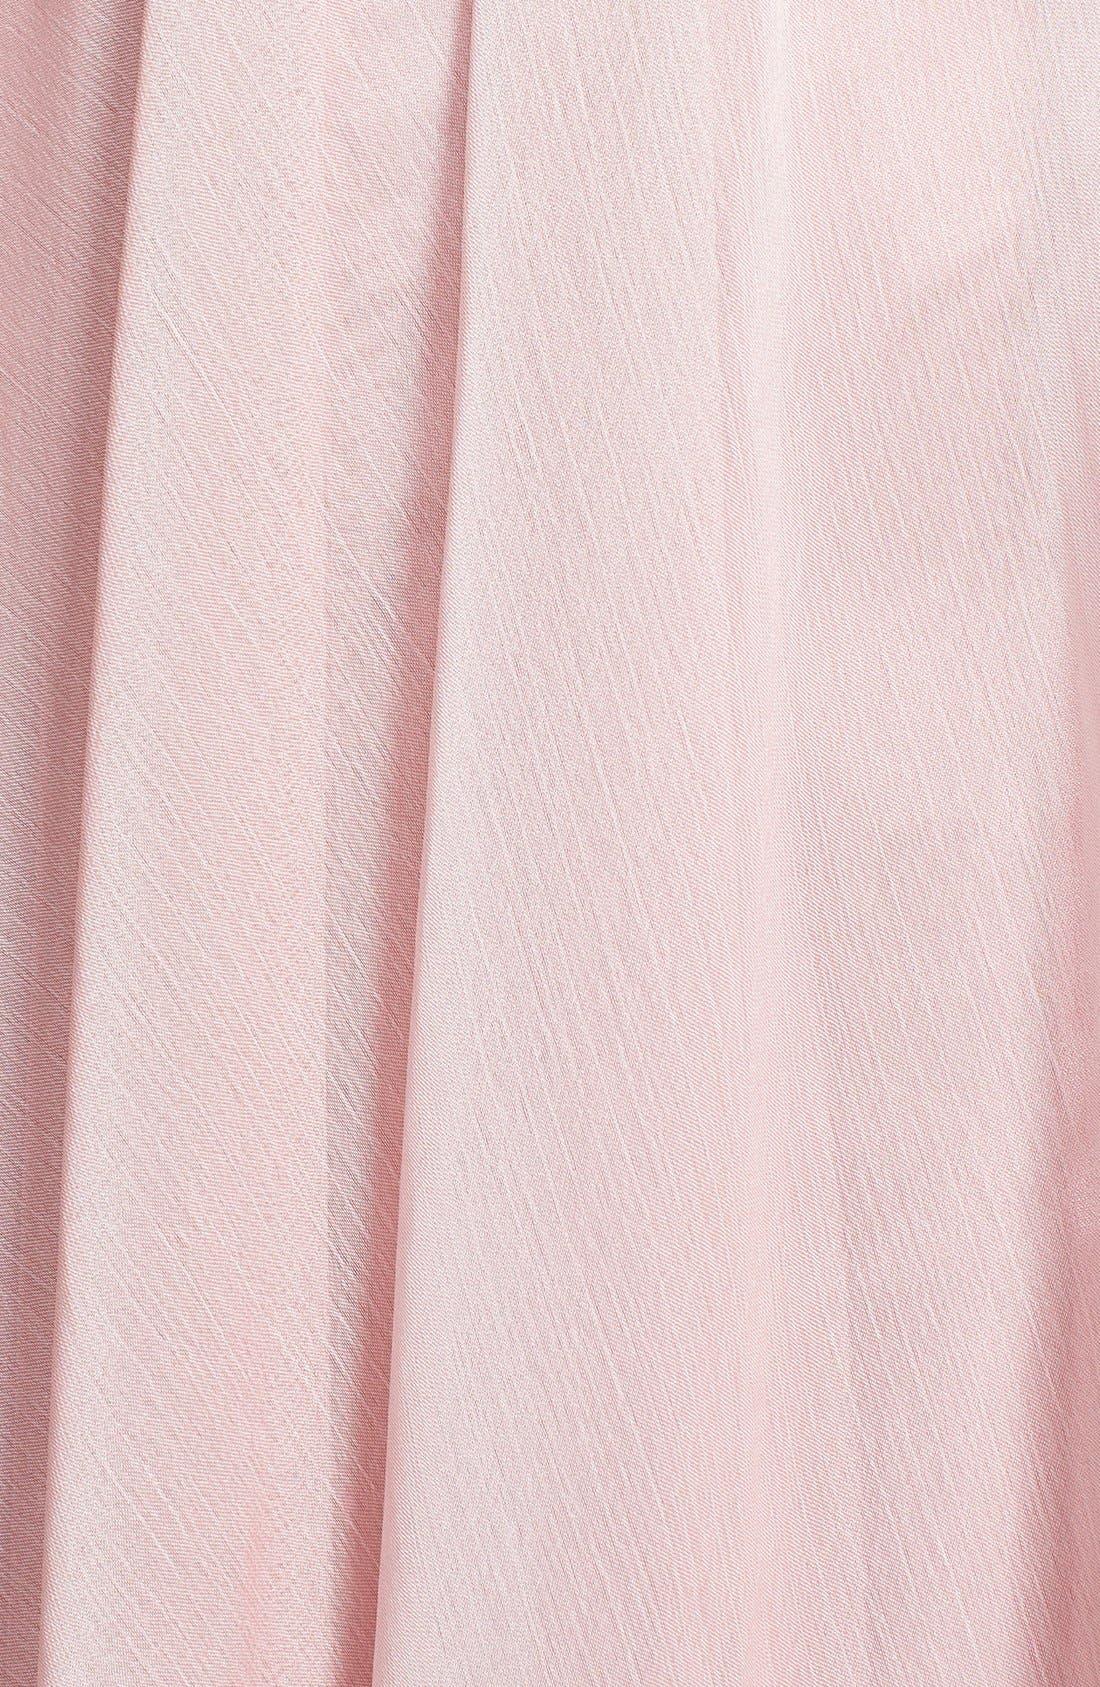 Alternate Image 3  - ML Monique Lhuillier Bridesmaids One-Shoulder Chiffon Gown (Nordstrom Exclusive)